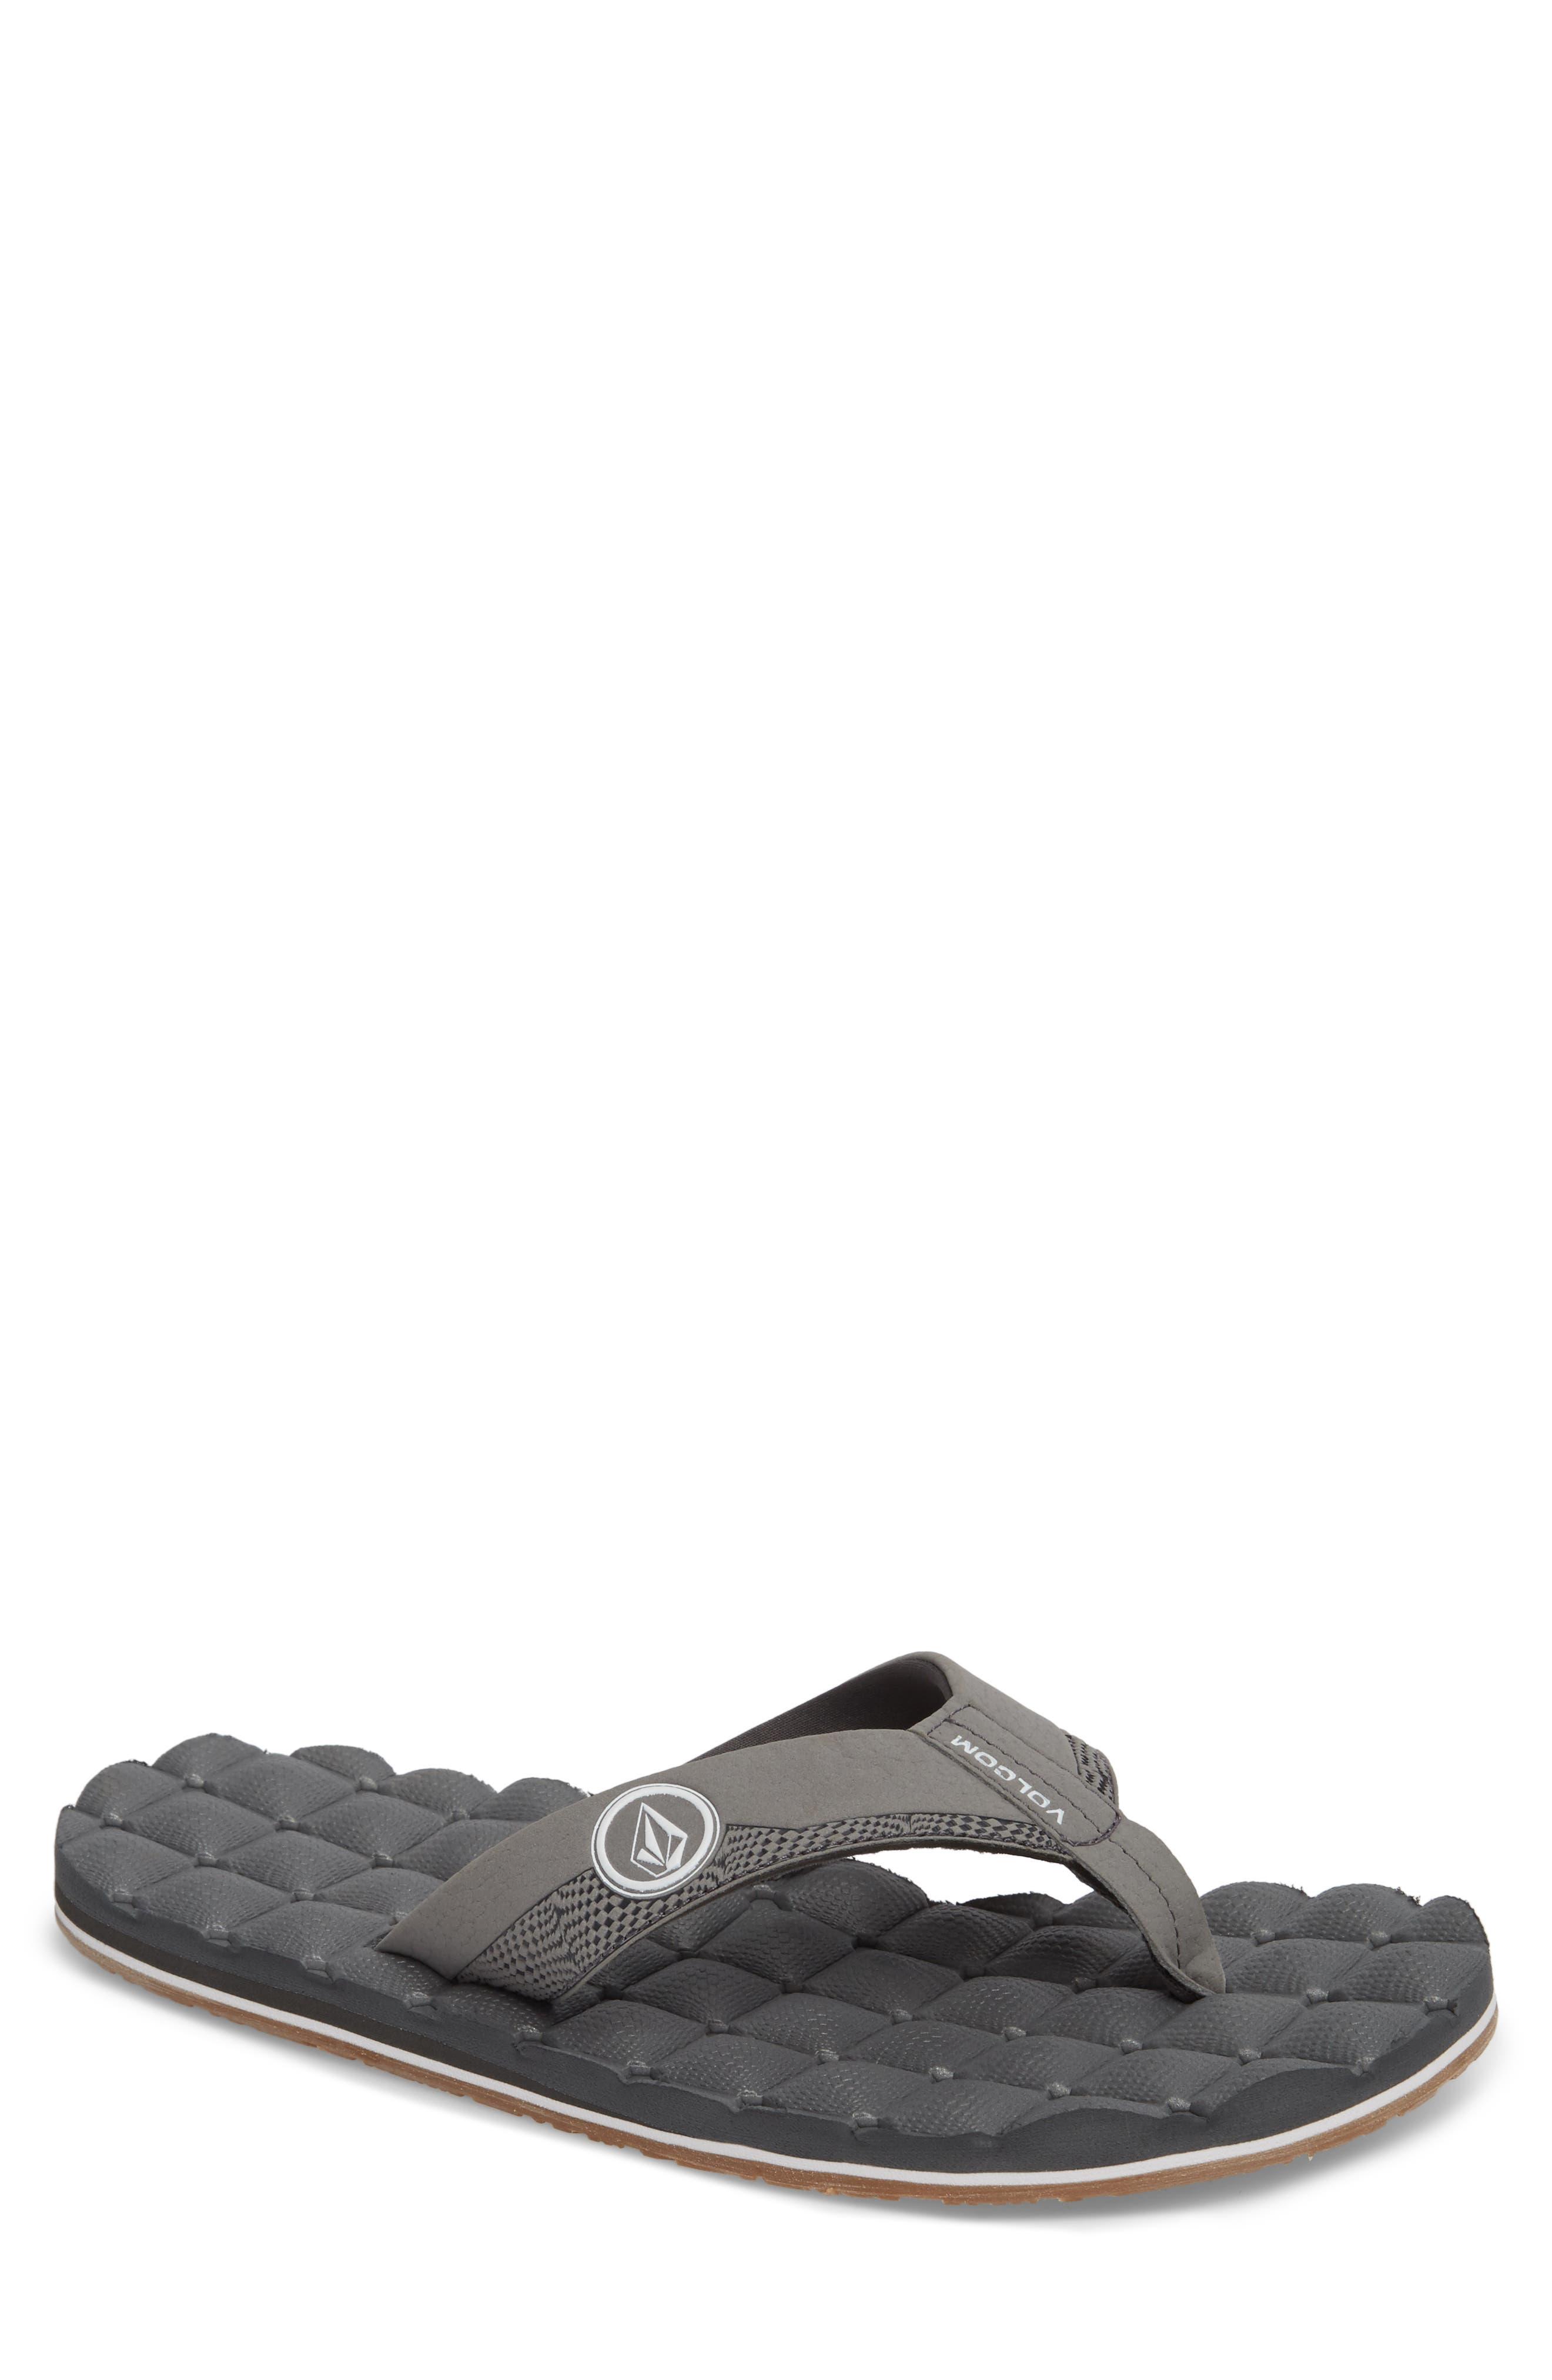 'Recliner' Flip Flop,                         Main,                         color, Light Grey